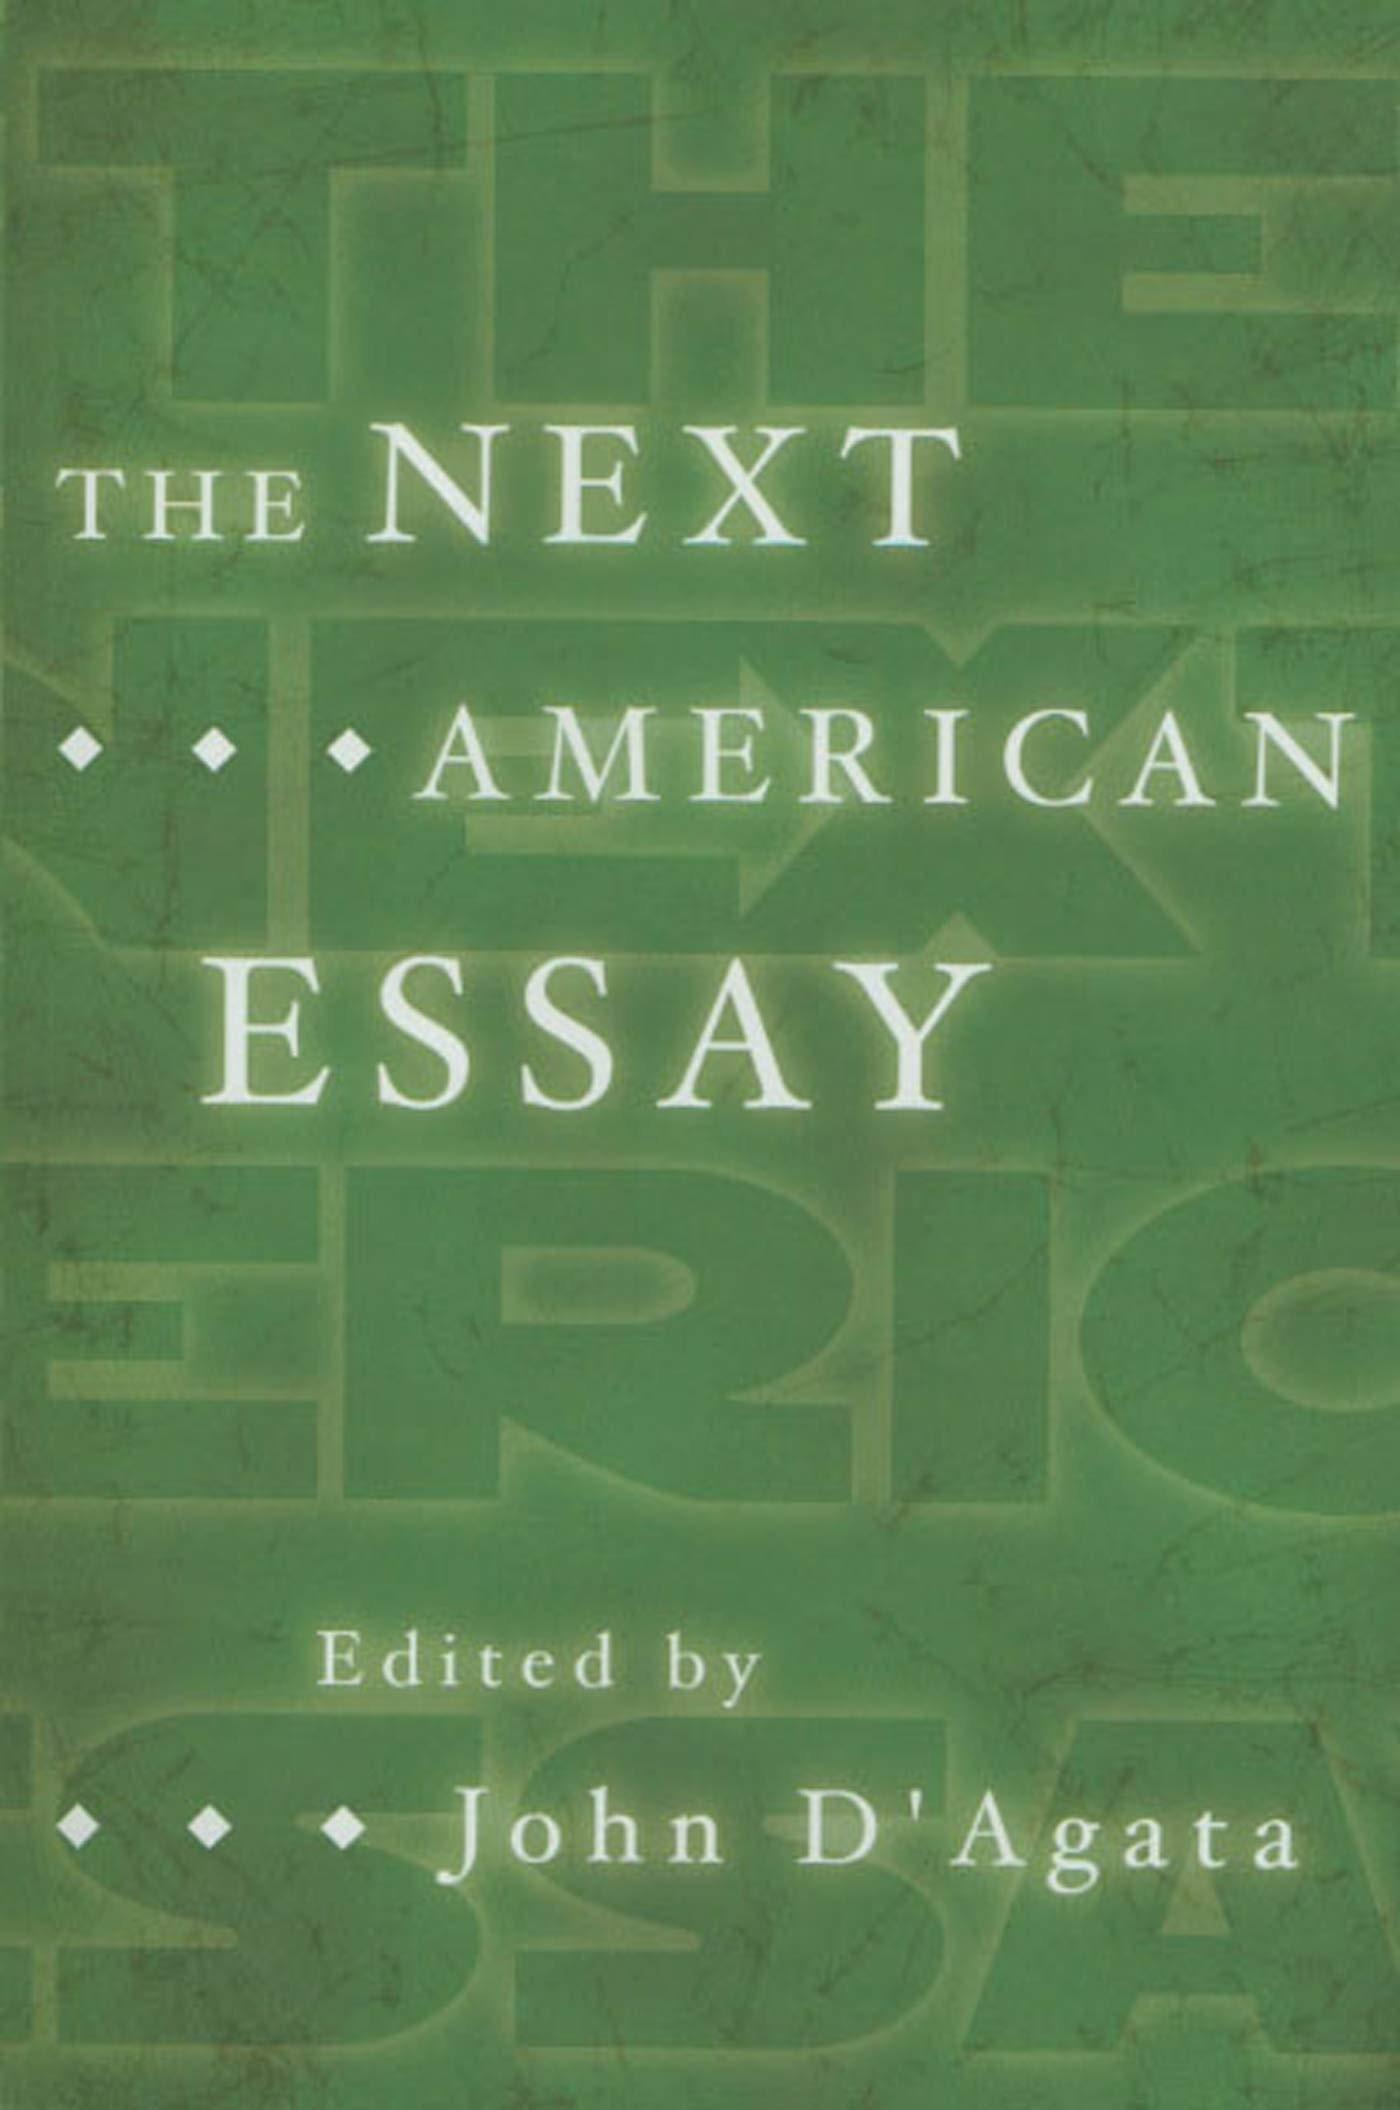 006 John Agata Essay 61uwmdqvqdl Stirring D D'agata Next American 1400